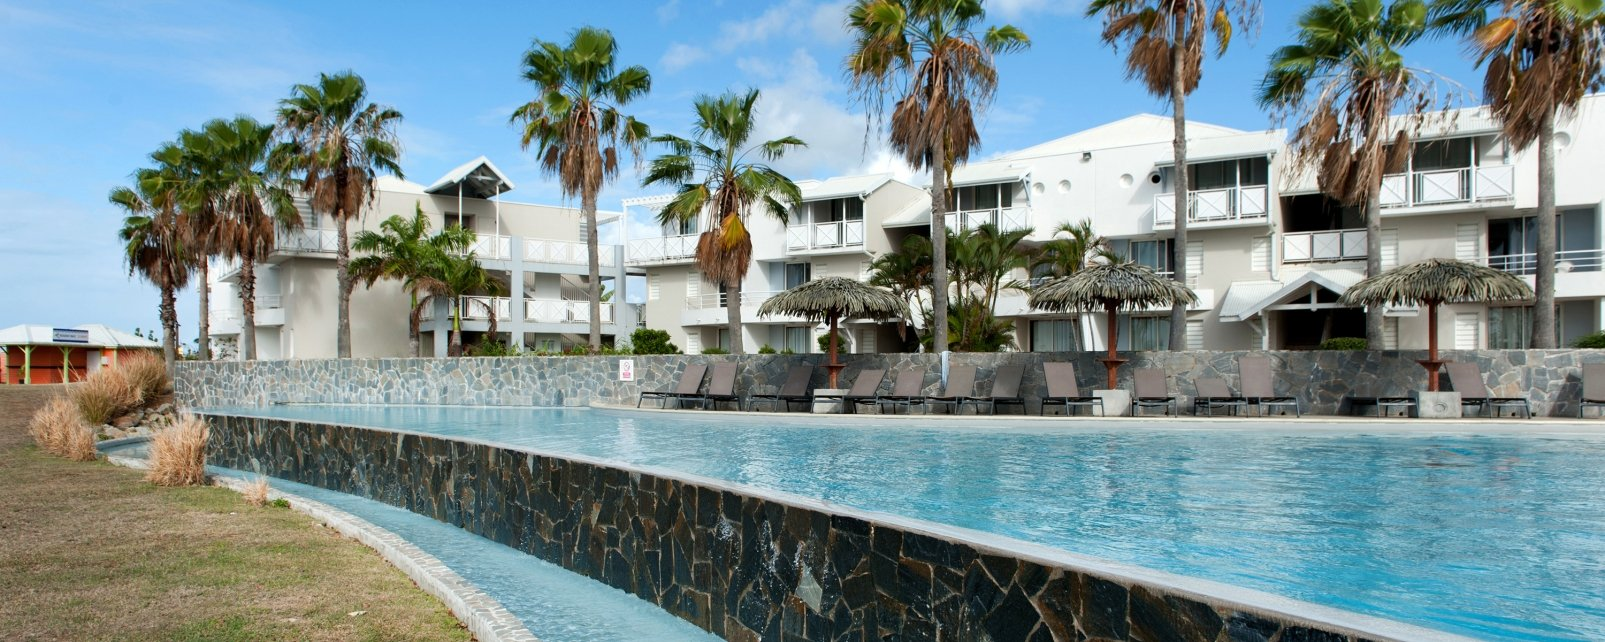 Hotel Amyris